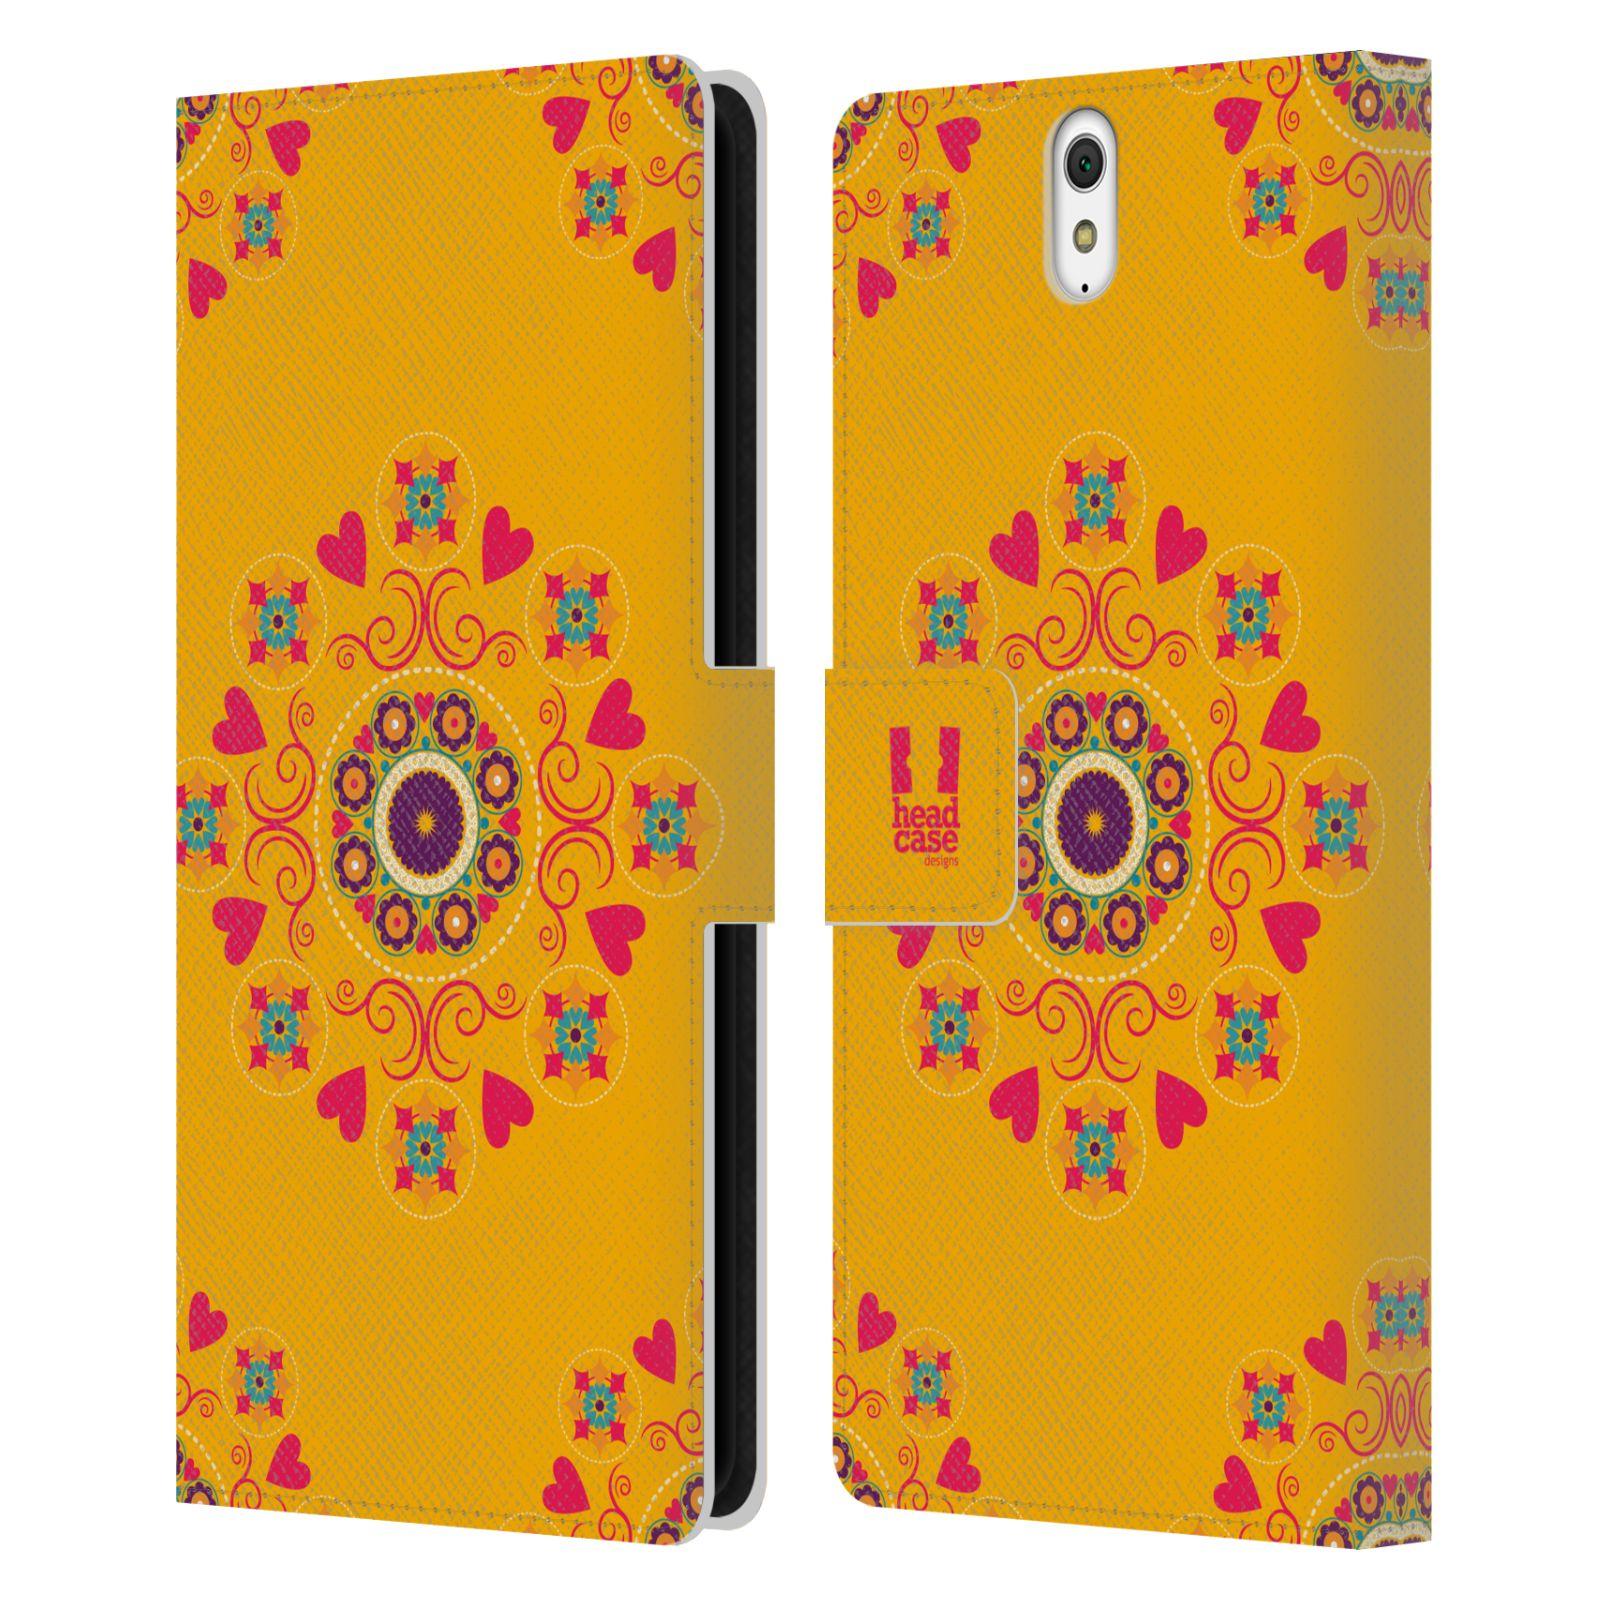 HEAD CASE Flipové pouzdro pro mobil SONY XPERIA C5 Ultra Slovanský vzor květiny a srdíčka žlutá